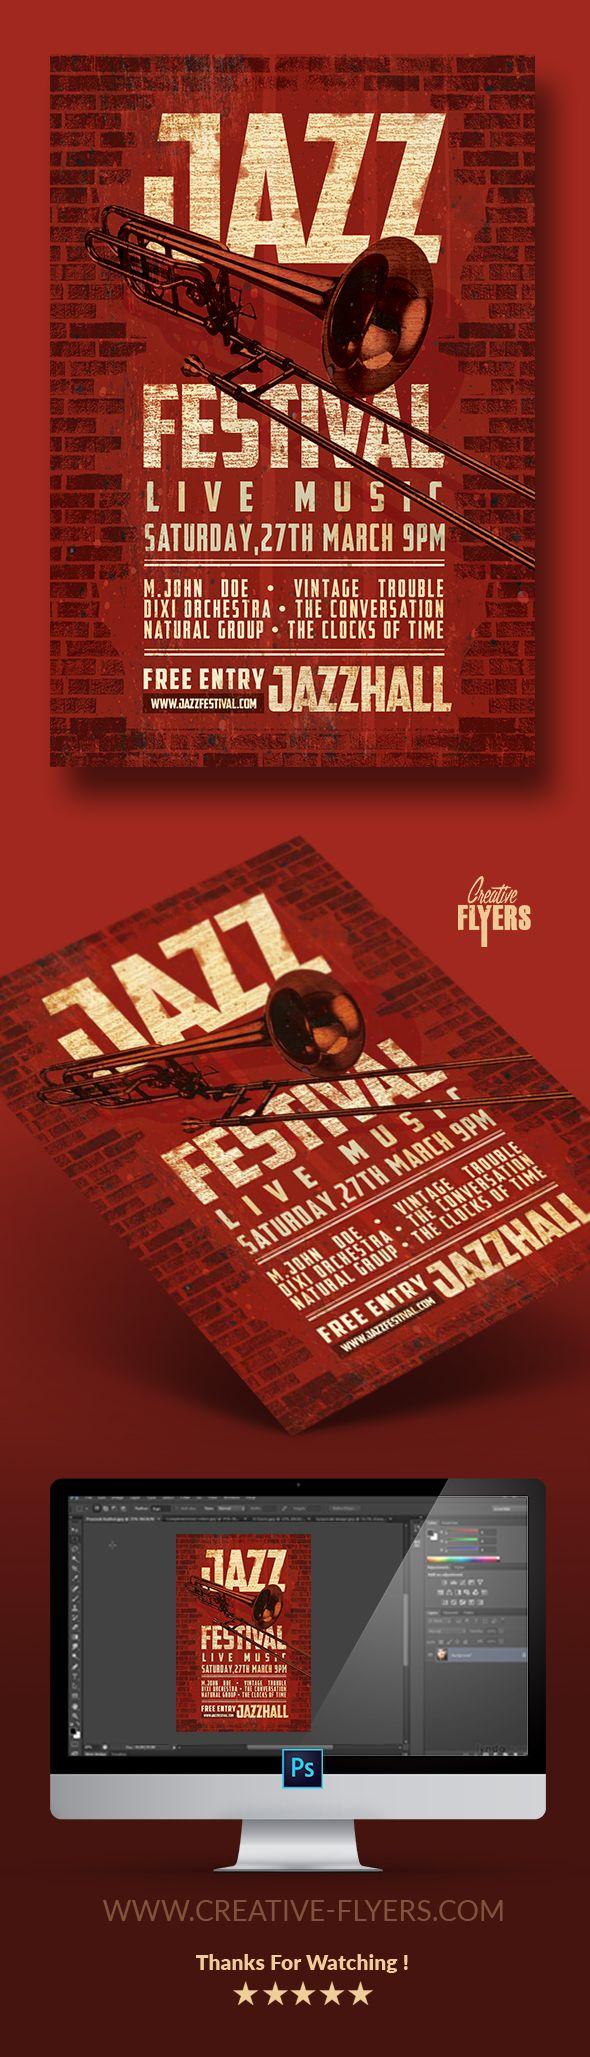 Jazz Festival Vintage Flyer Psd Template - Creativeflyers | Flyer Templates  | Pinterest | Creative Flyers, Flyer Template And Jazz Festival